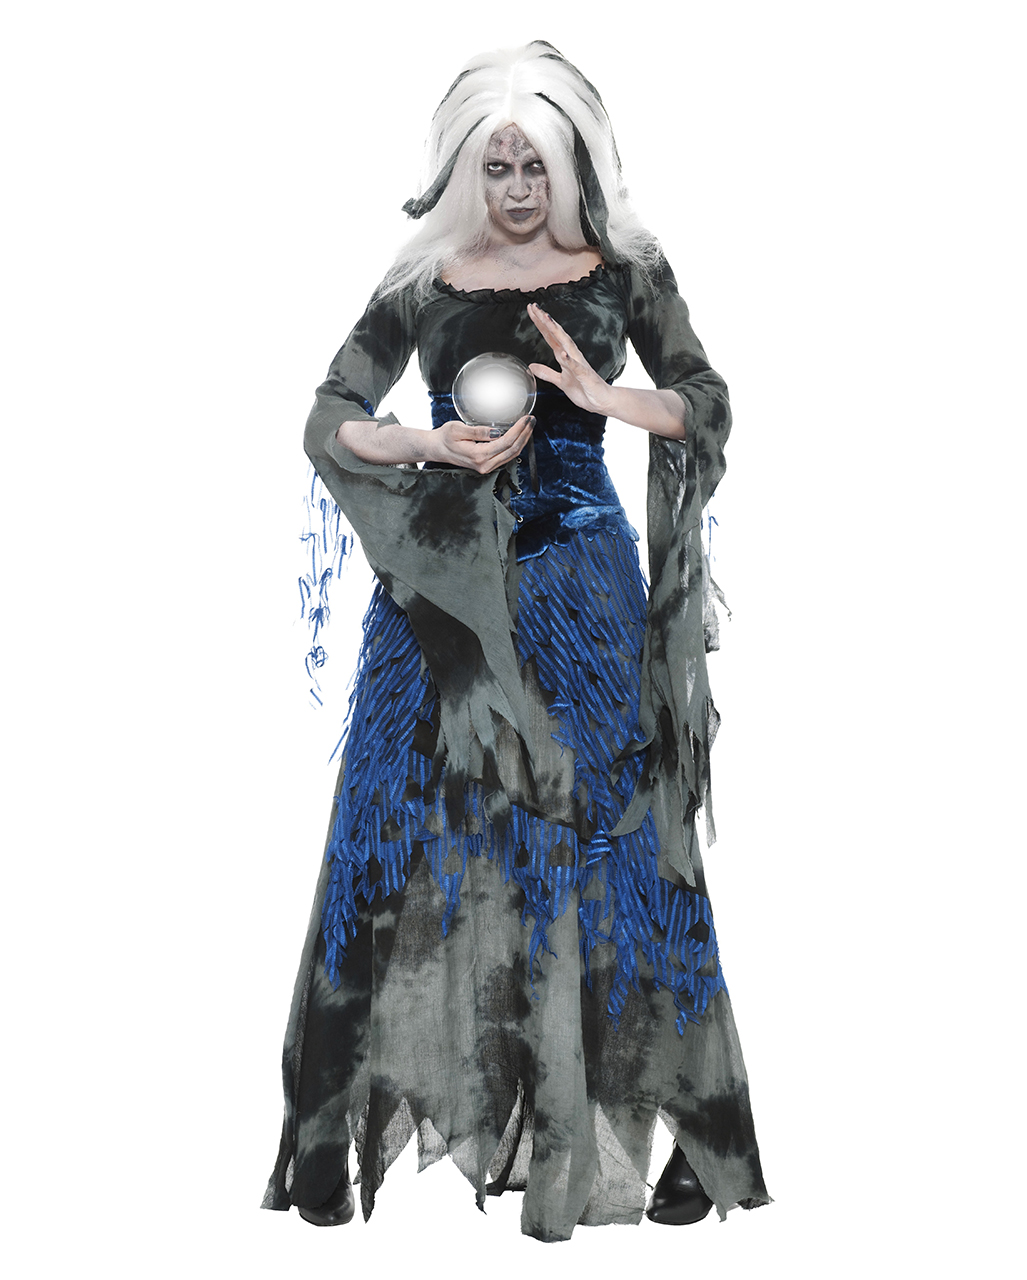 Fortune Teller Costume ...  sc 1 st  Horror-Shop.com & Fortune Teller Costume | Zombie Costume for Halloween | horror-shop.com